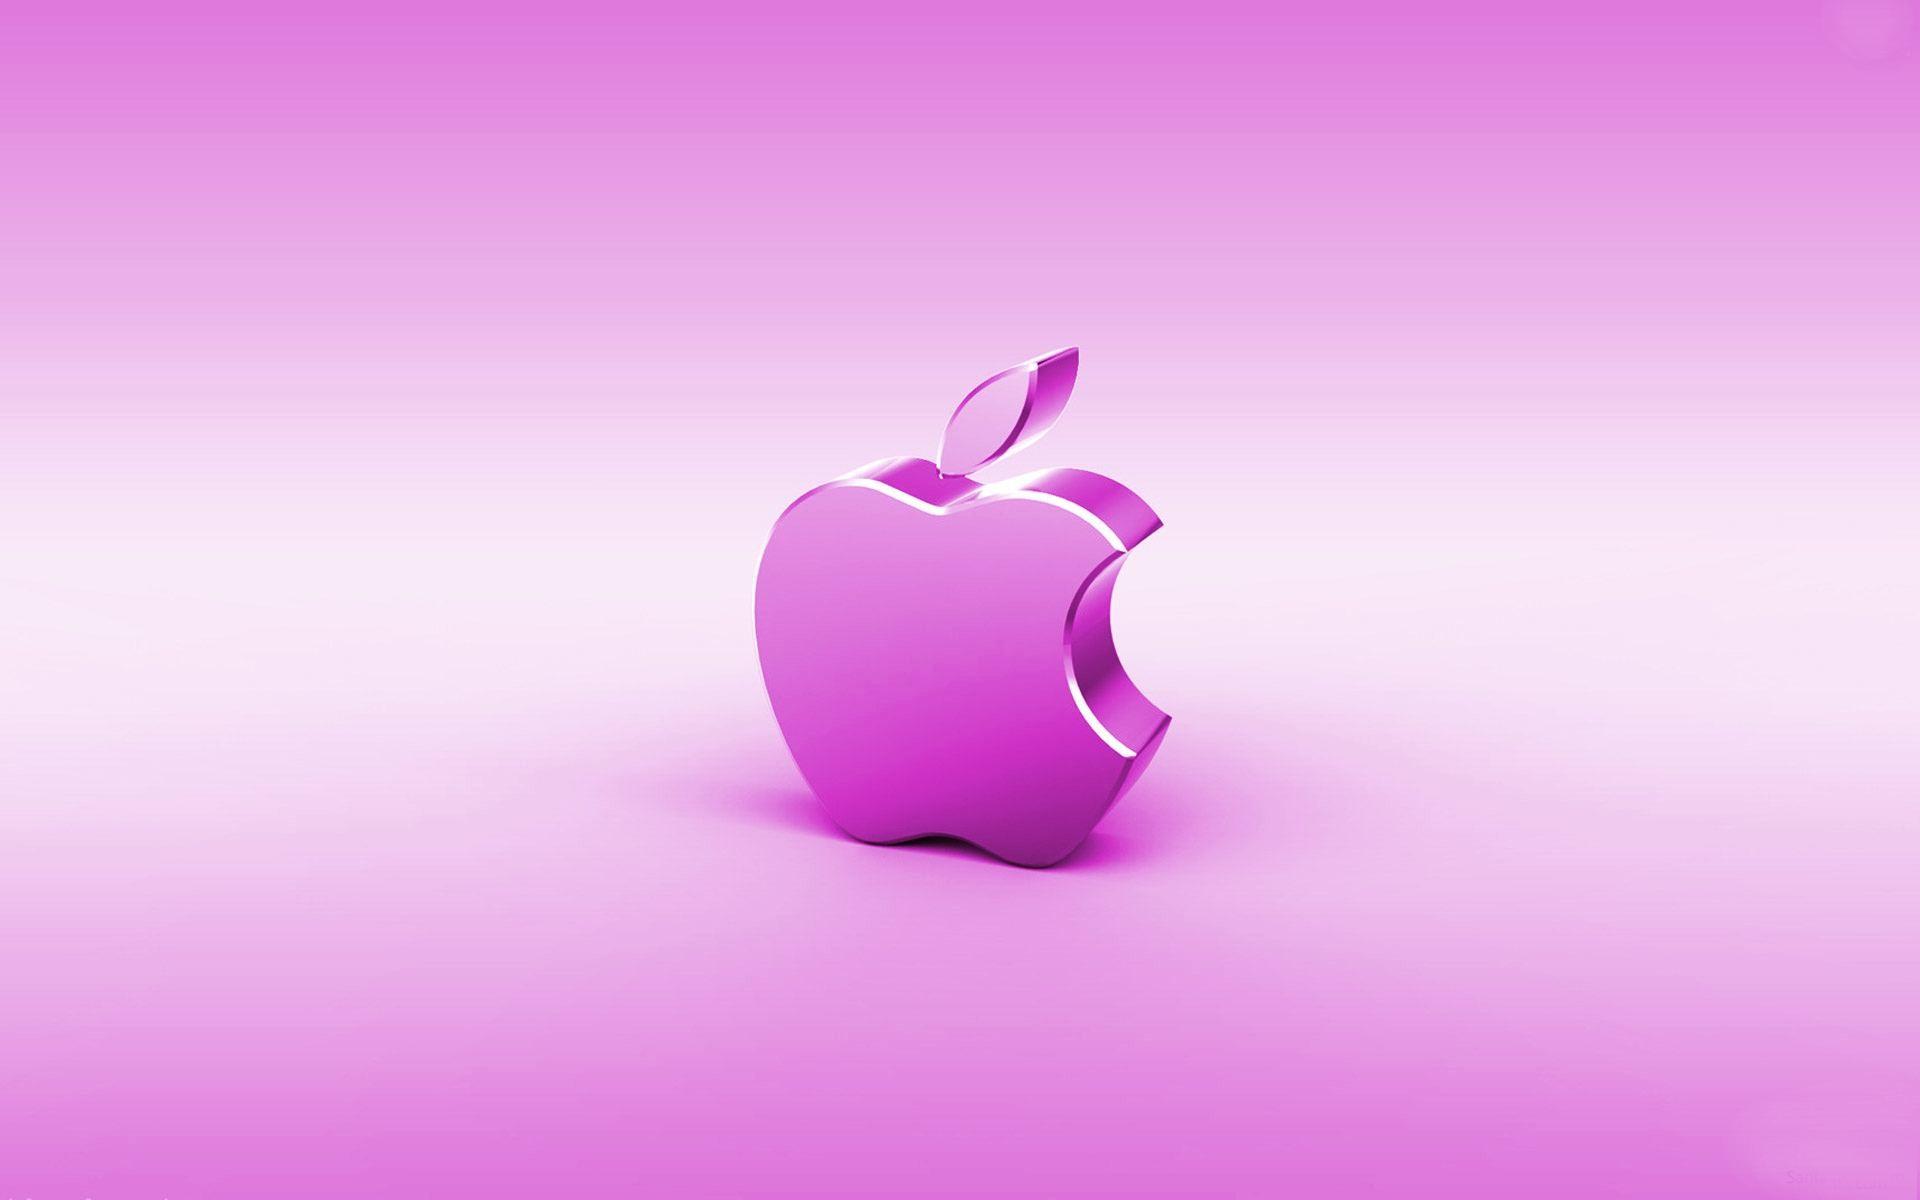 0 apple wallpaper High Resolution Download apple wallpapers hd Download